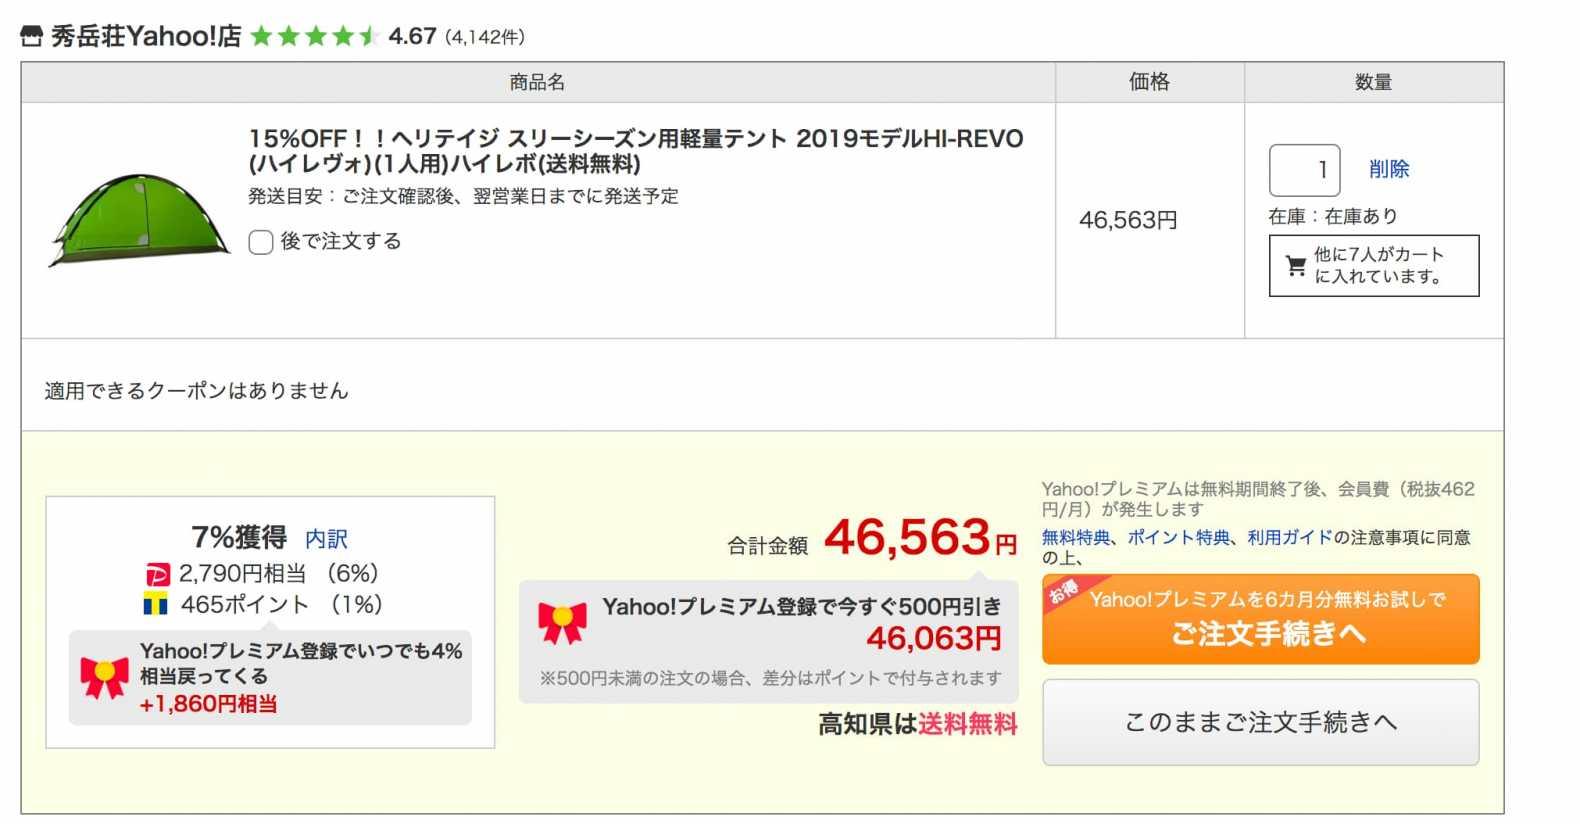 - PayPayモールショッピングカート一覧 - Yahoo!ショッピング - ネットで通販、オンラインショッピング - order.shopping.yahoo.co.jp